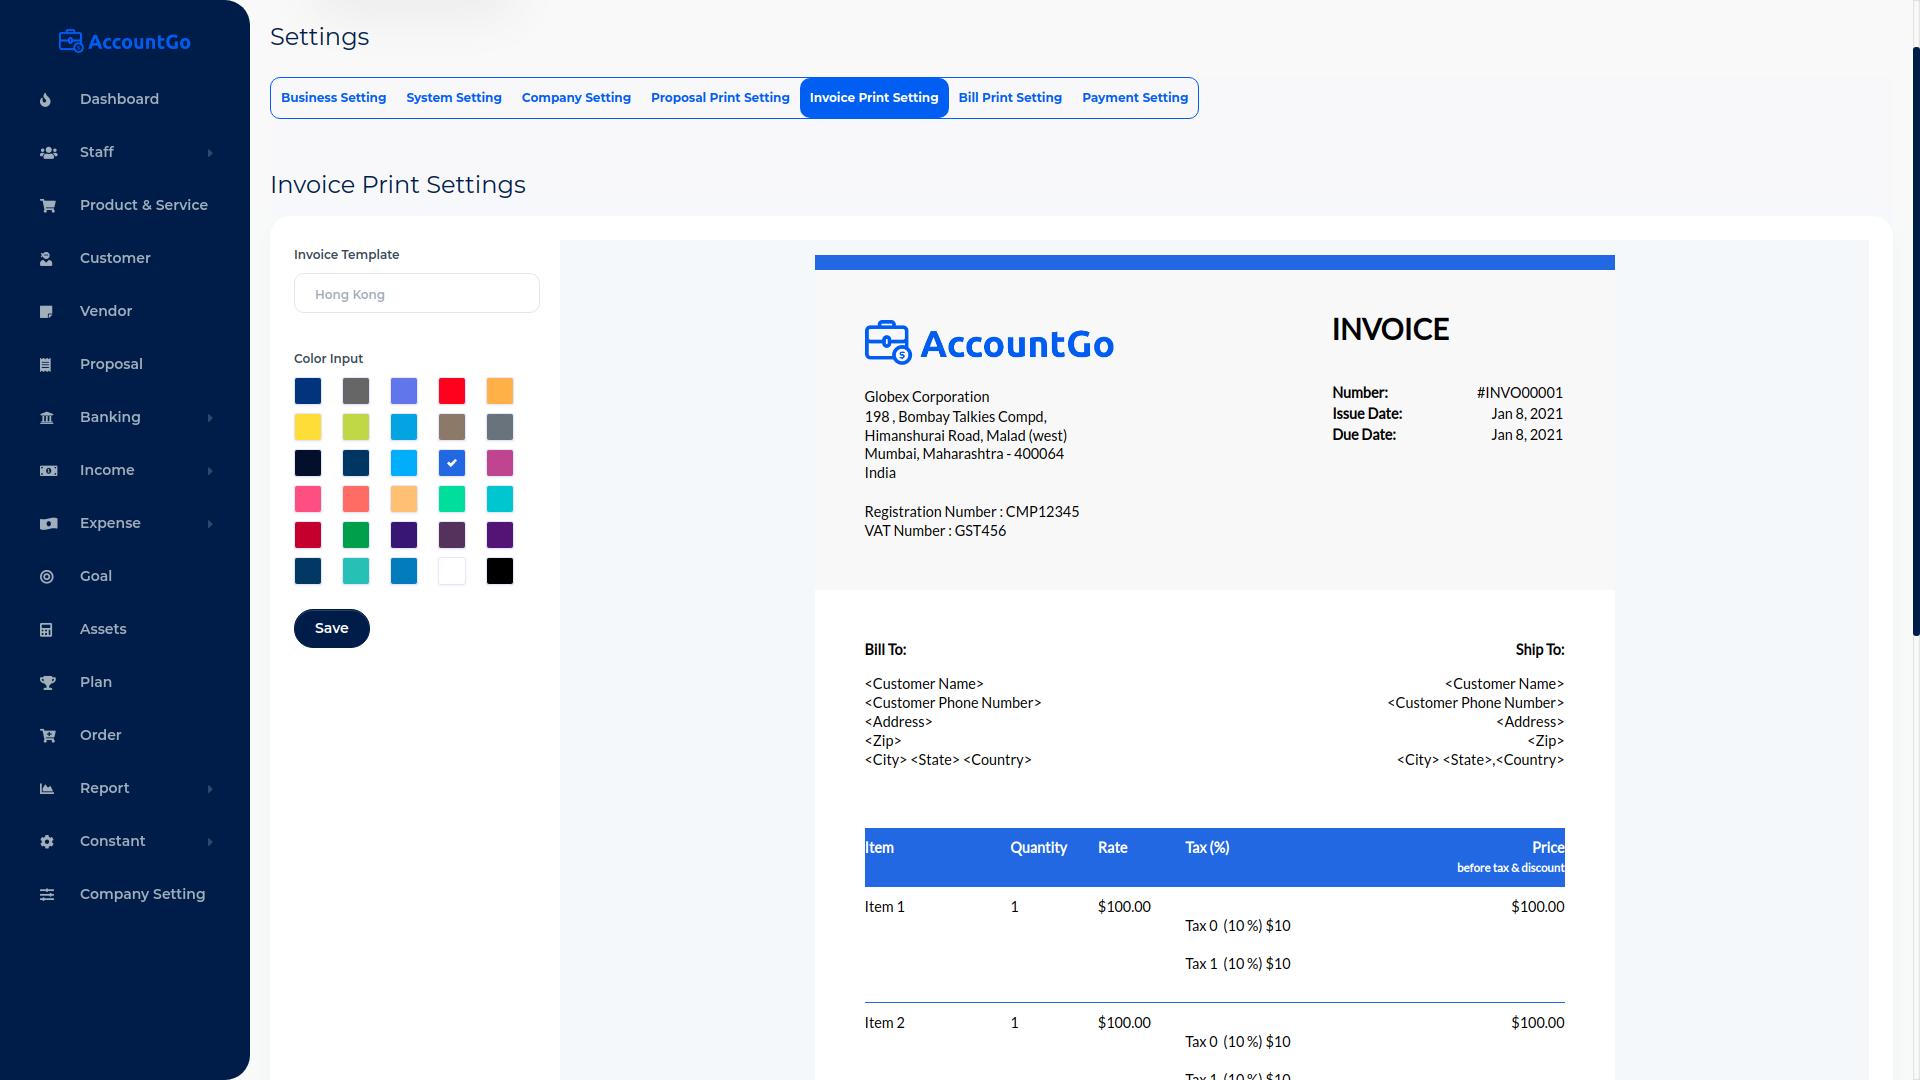 AccountGo SaaS - Accounting and Billing Tool - 17